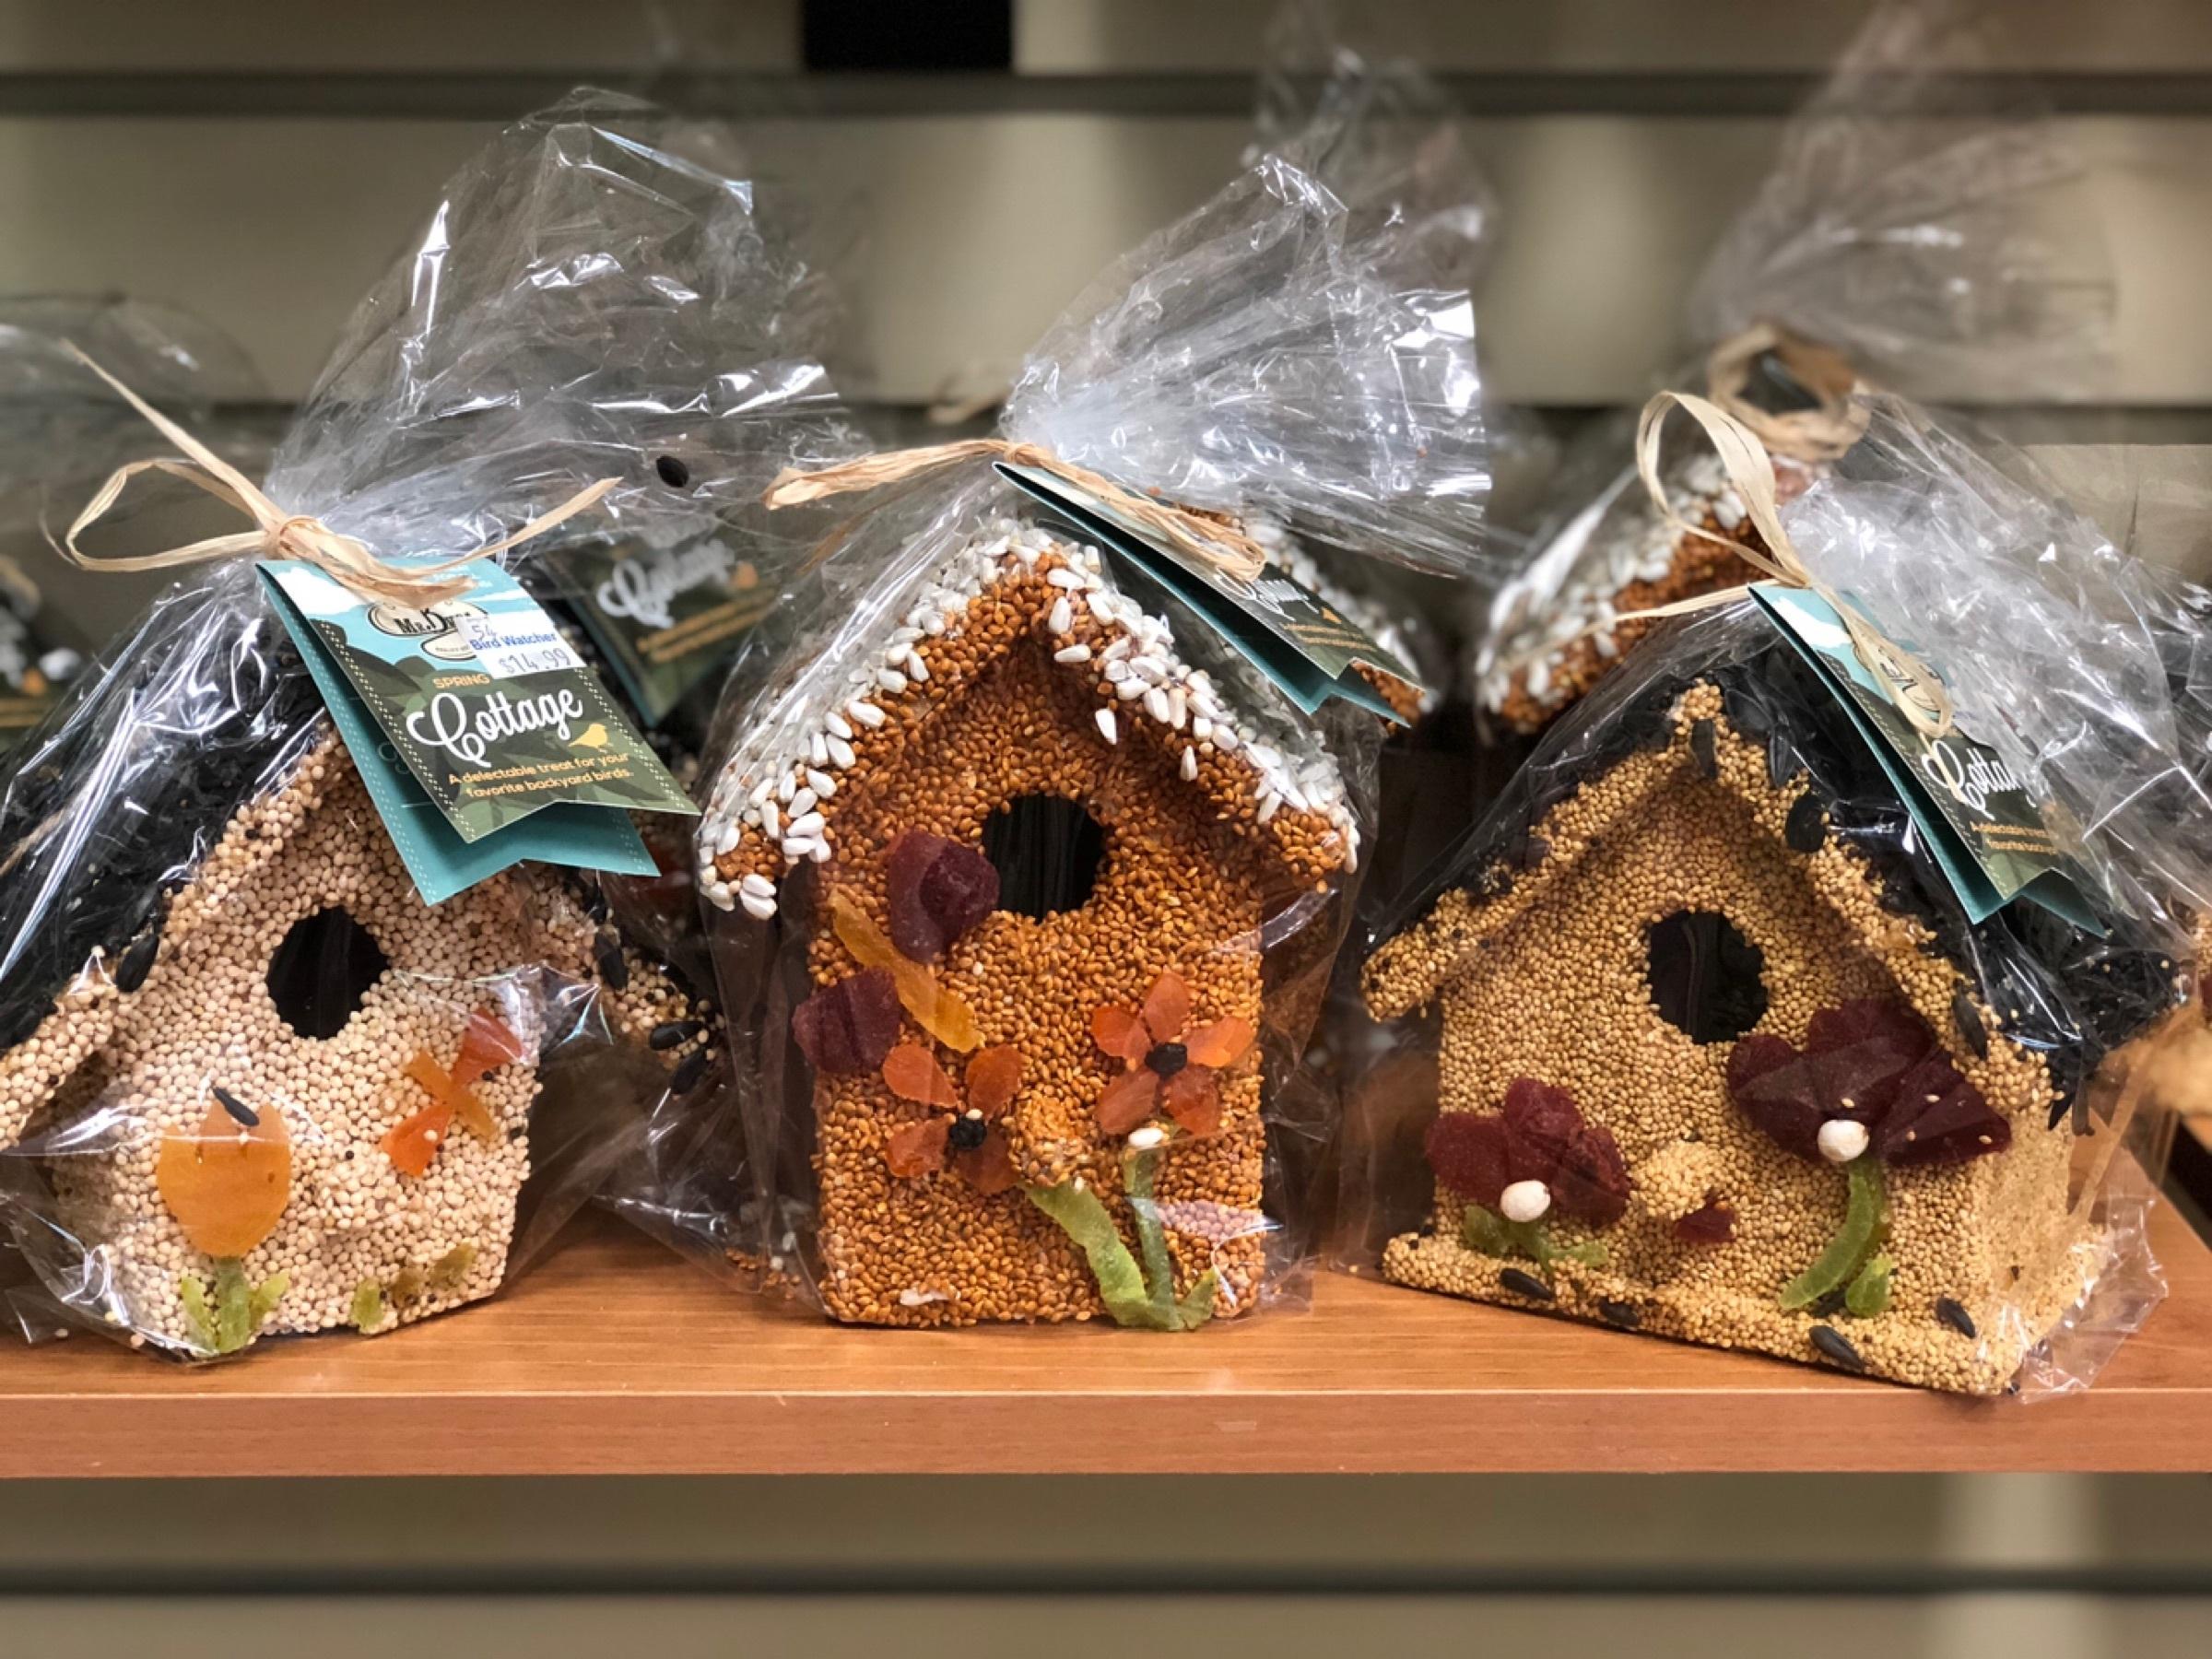 bird seed, house, edible, seeds, fruit, gift, teacher, mother's day